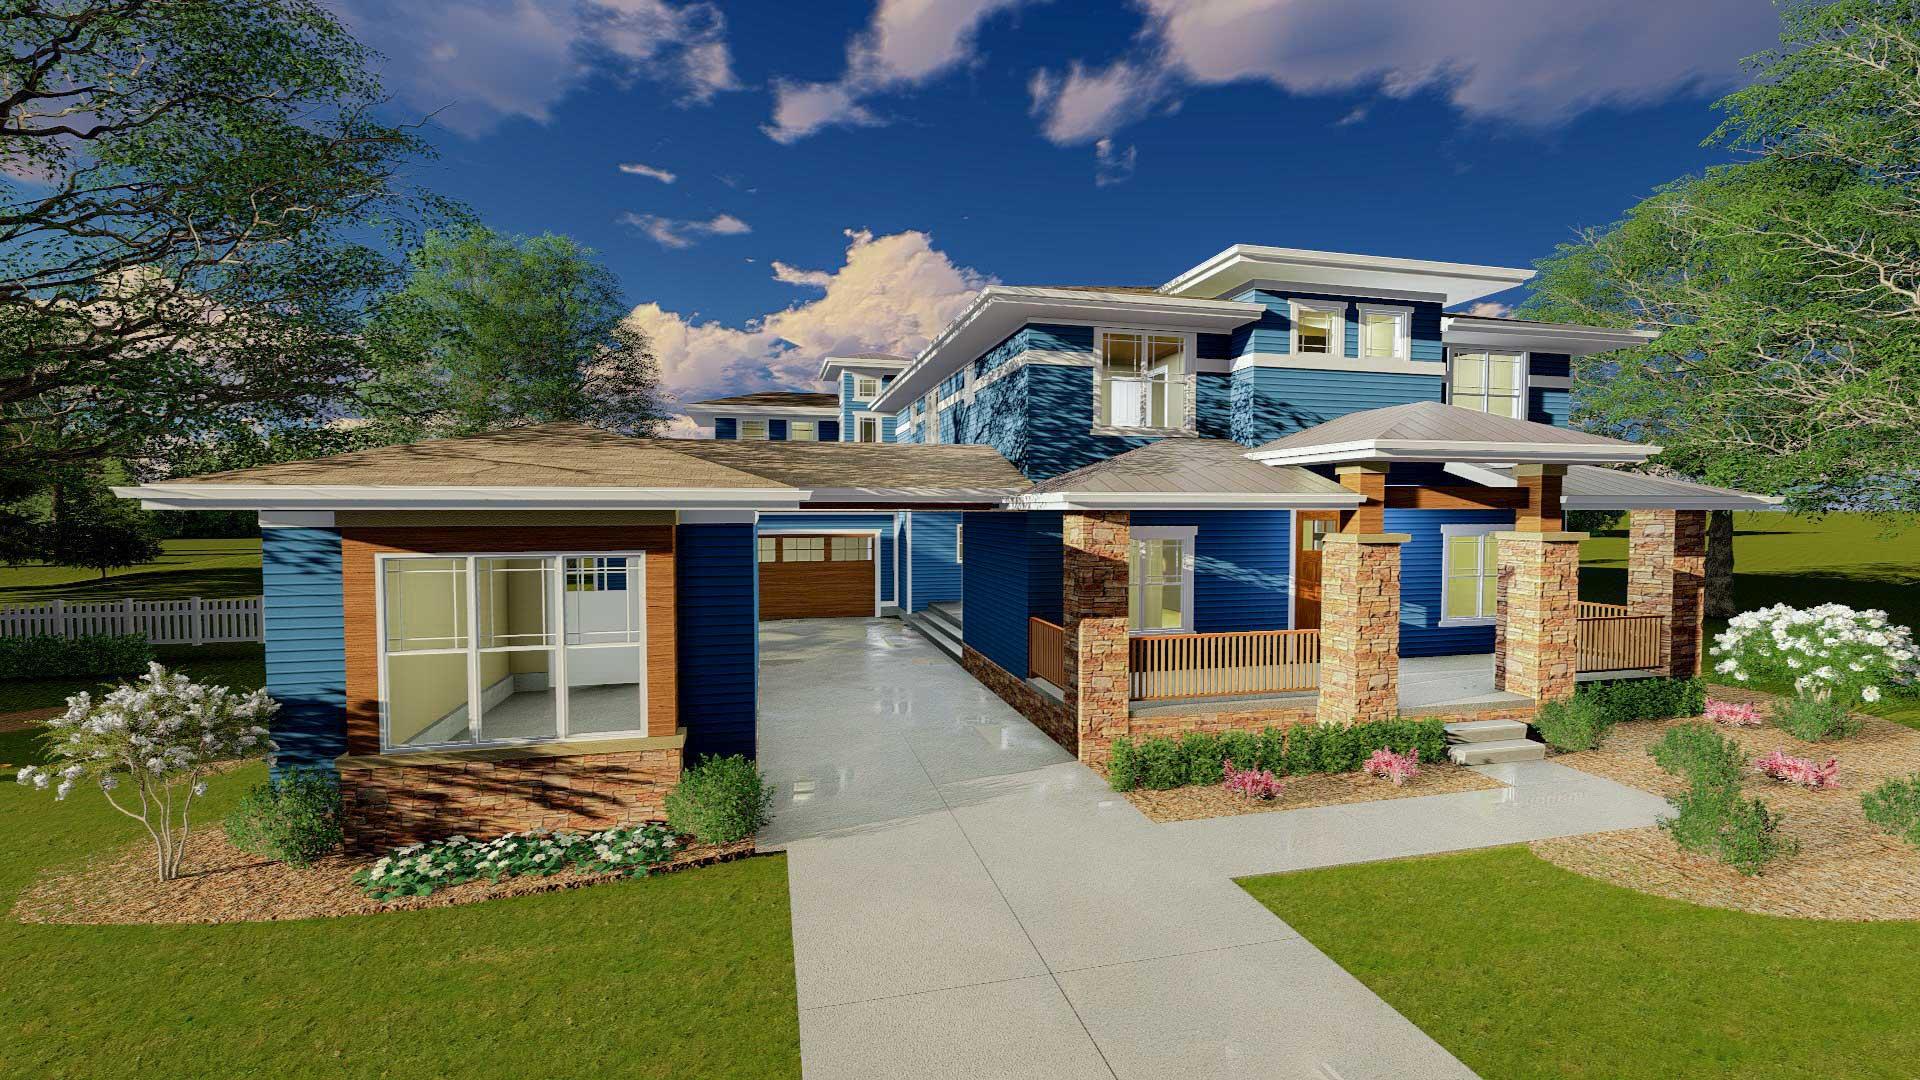 Prairie Style House Plan With Porte Cochere - 62561dj